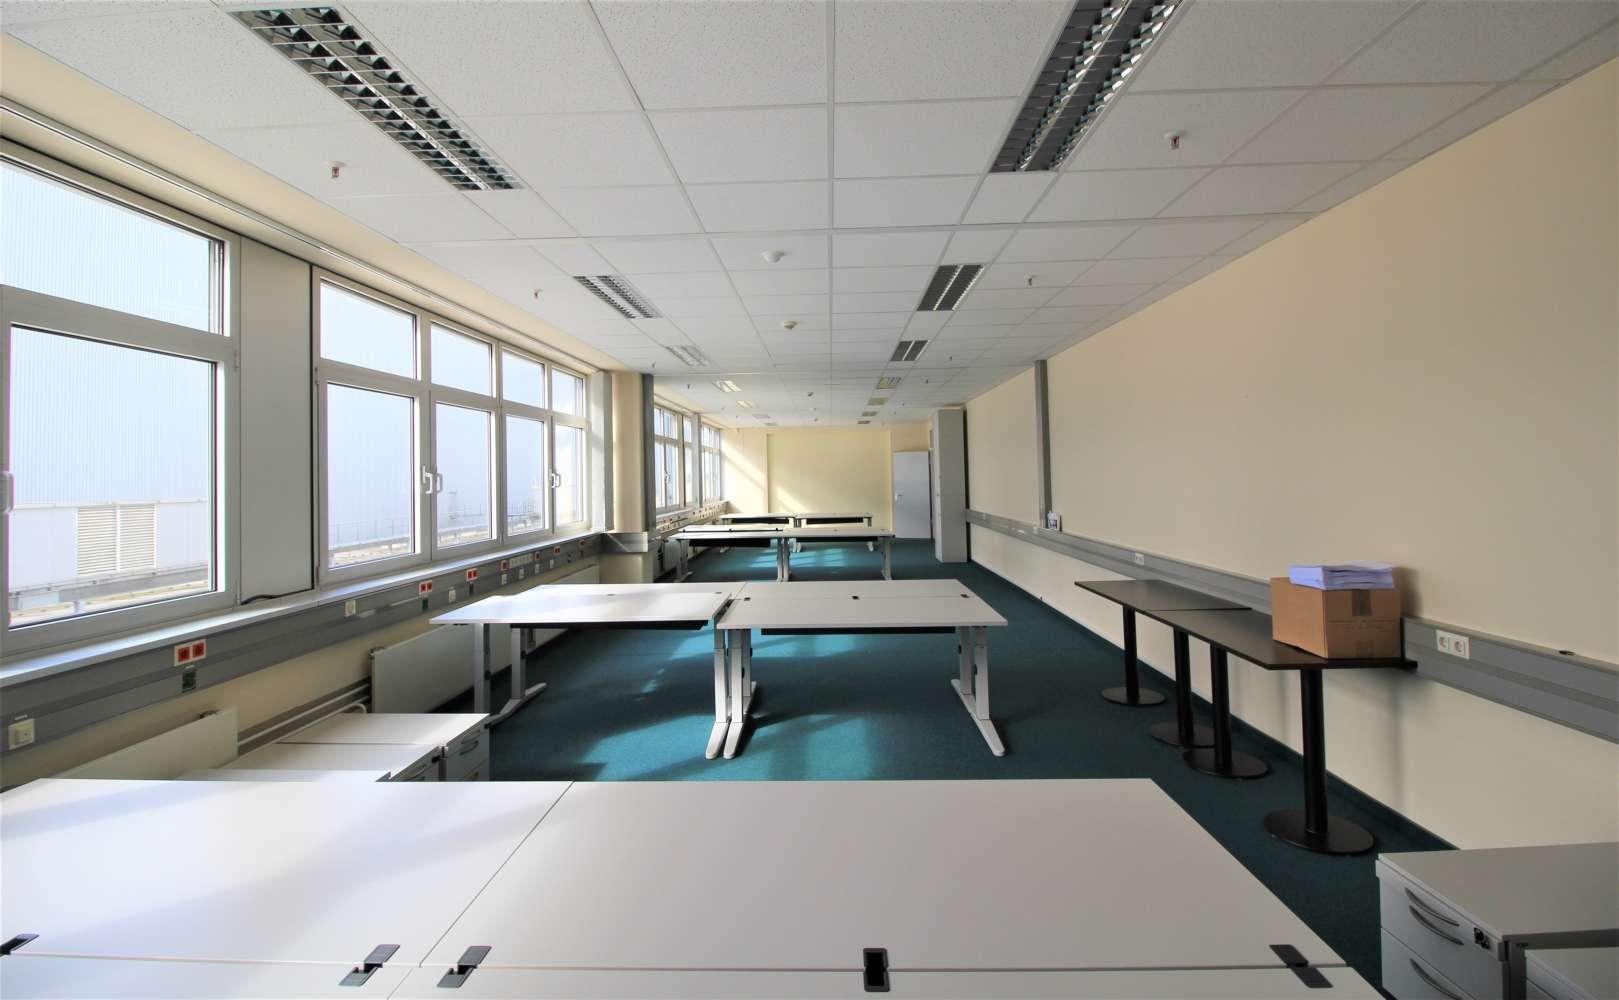 Büros Leipzig, 04356 - Büro - Leipzig, Seehausen - B1693 - 10041964